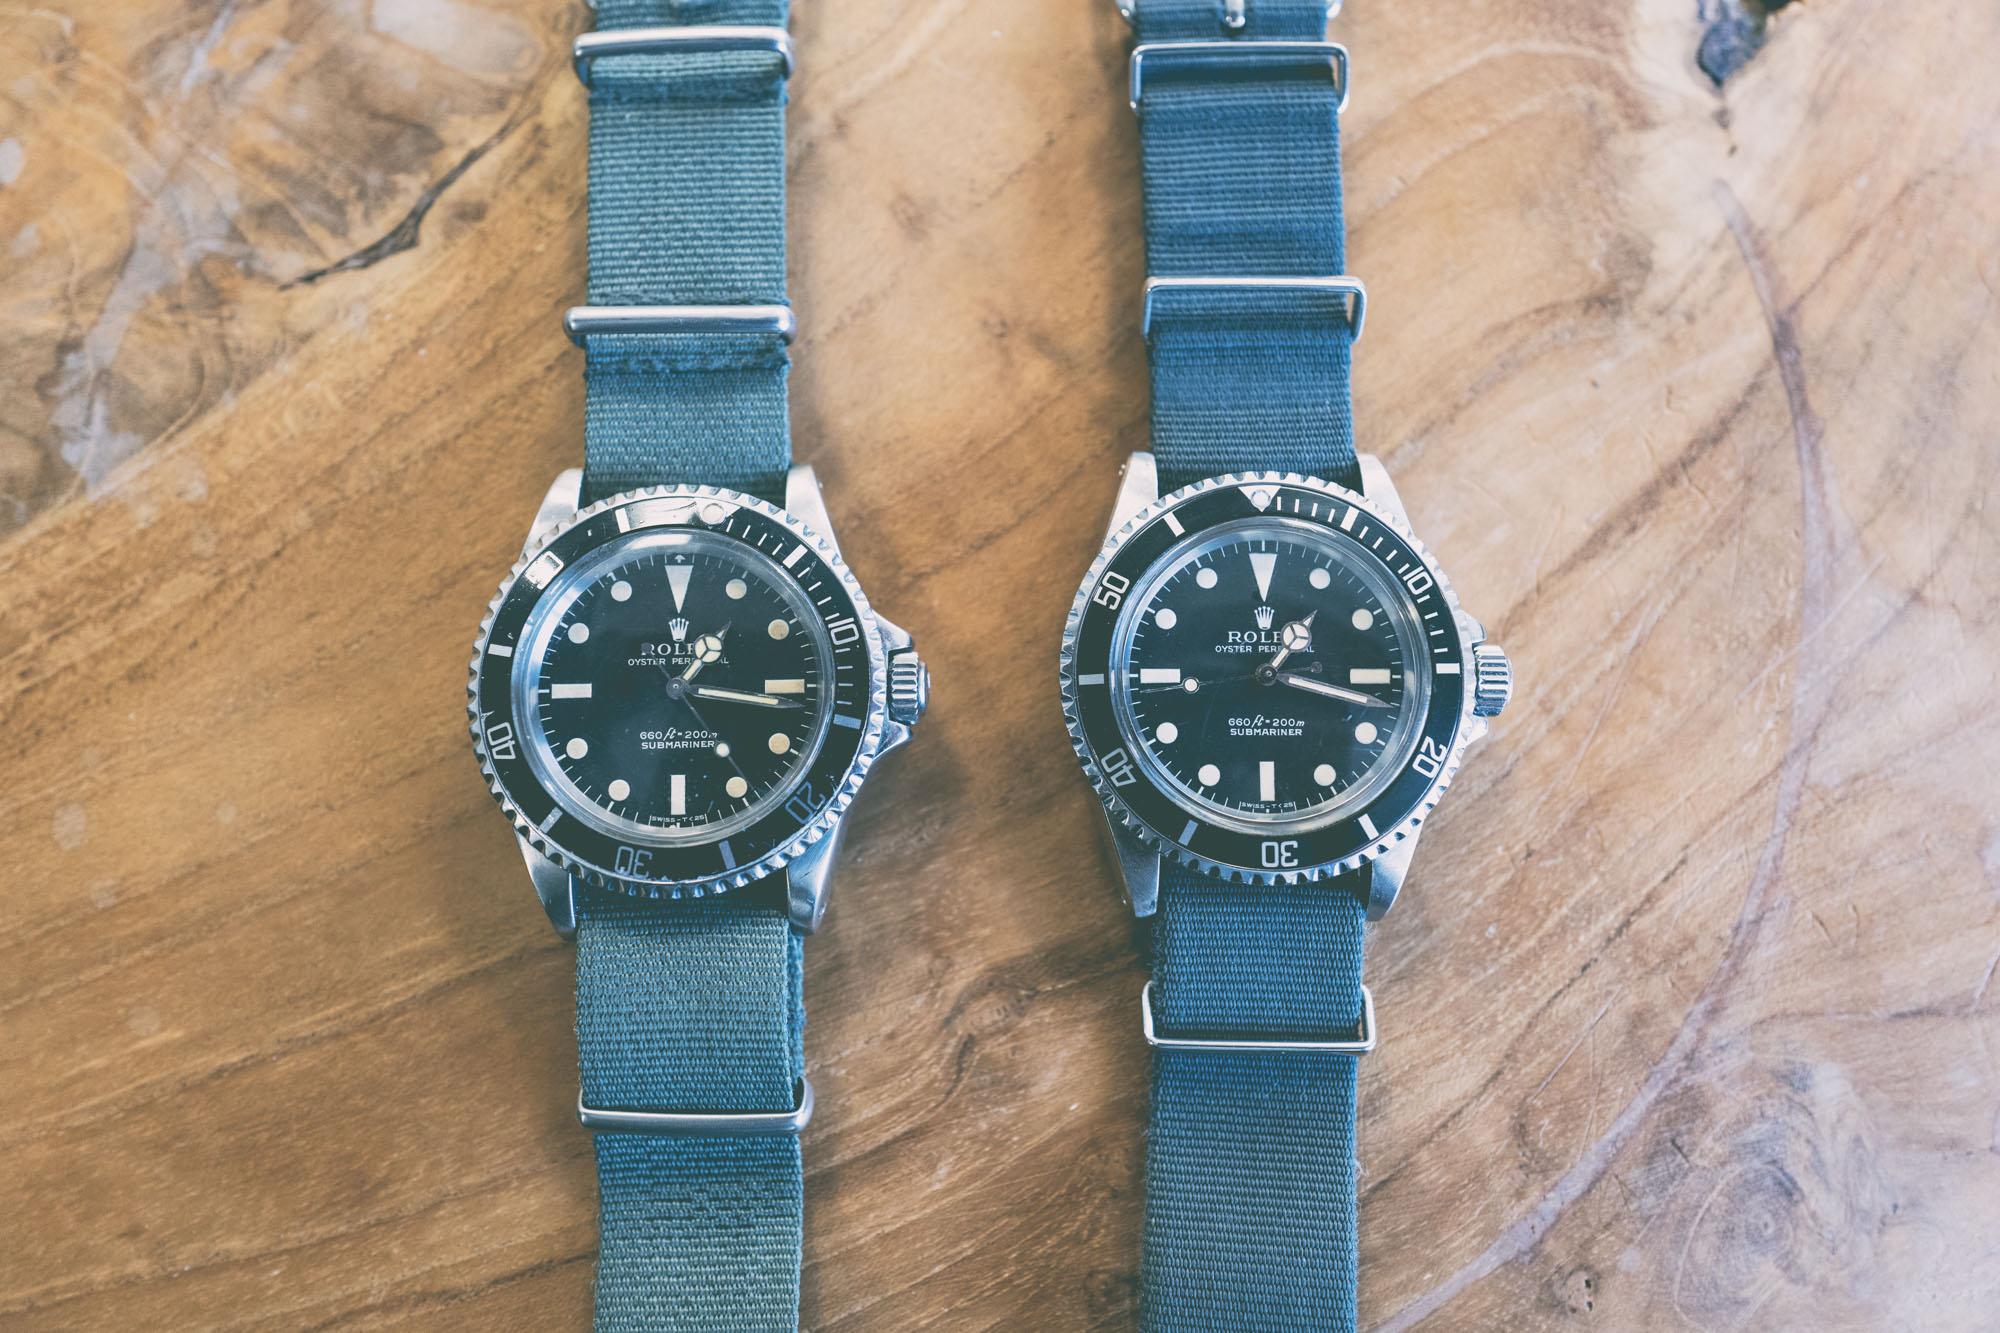 Rolex Submariner 5513 - Bracelets Nato